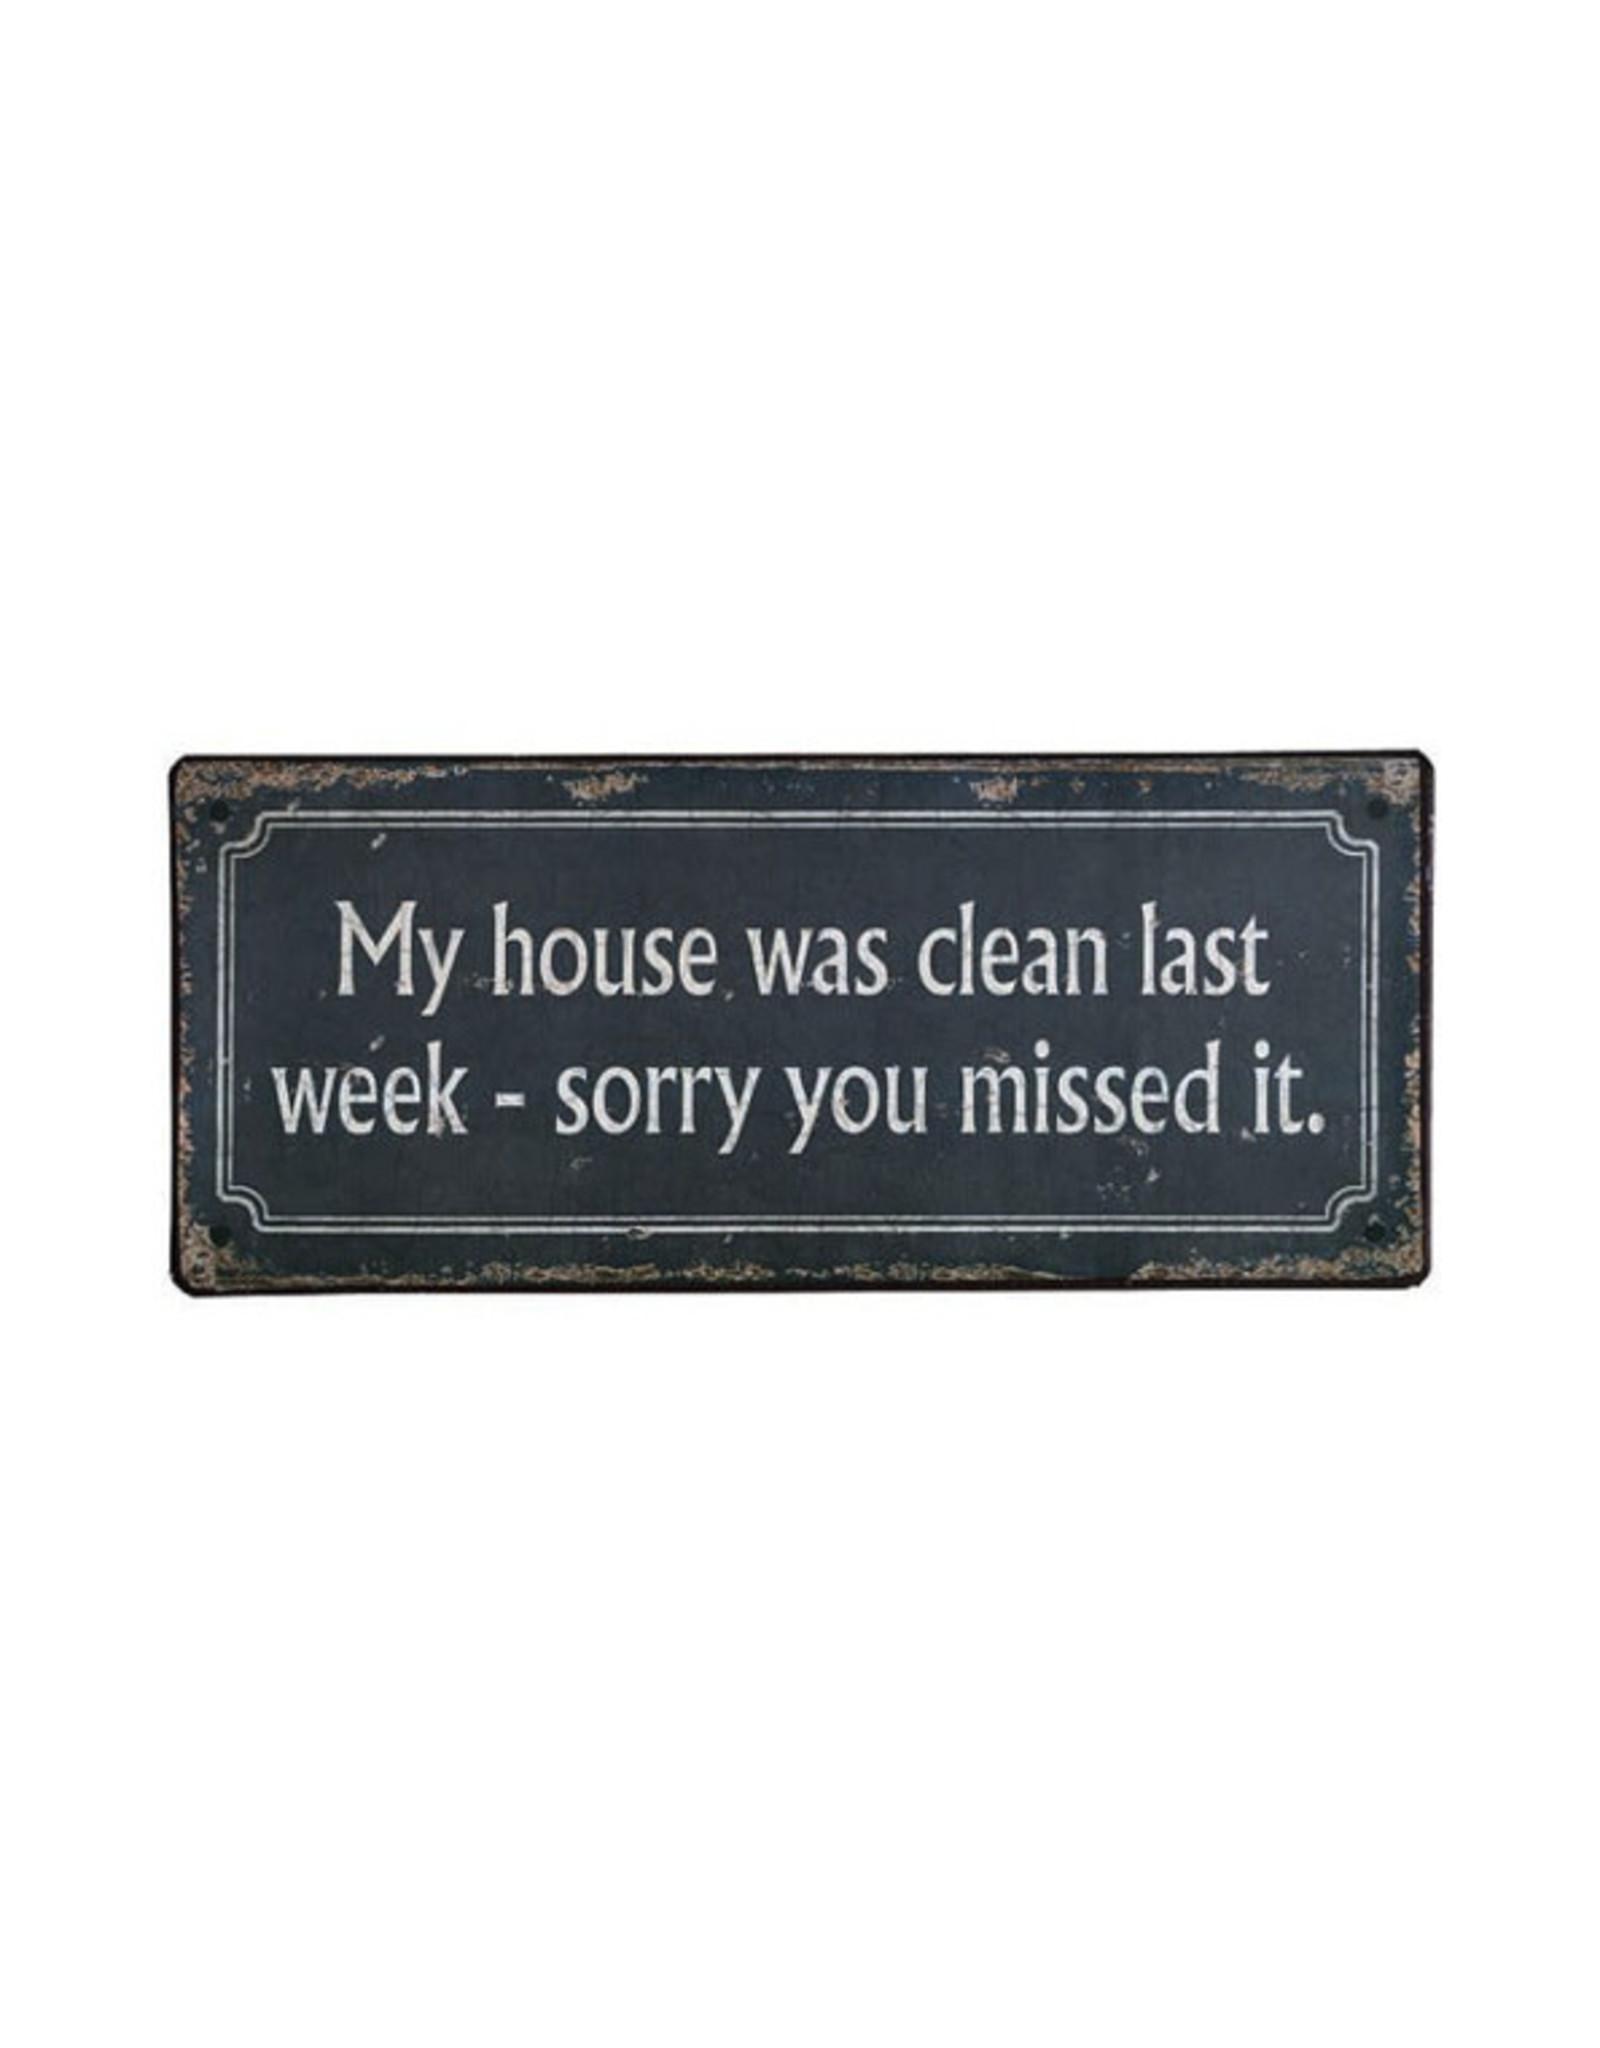 sign - my house was clean last week